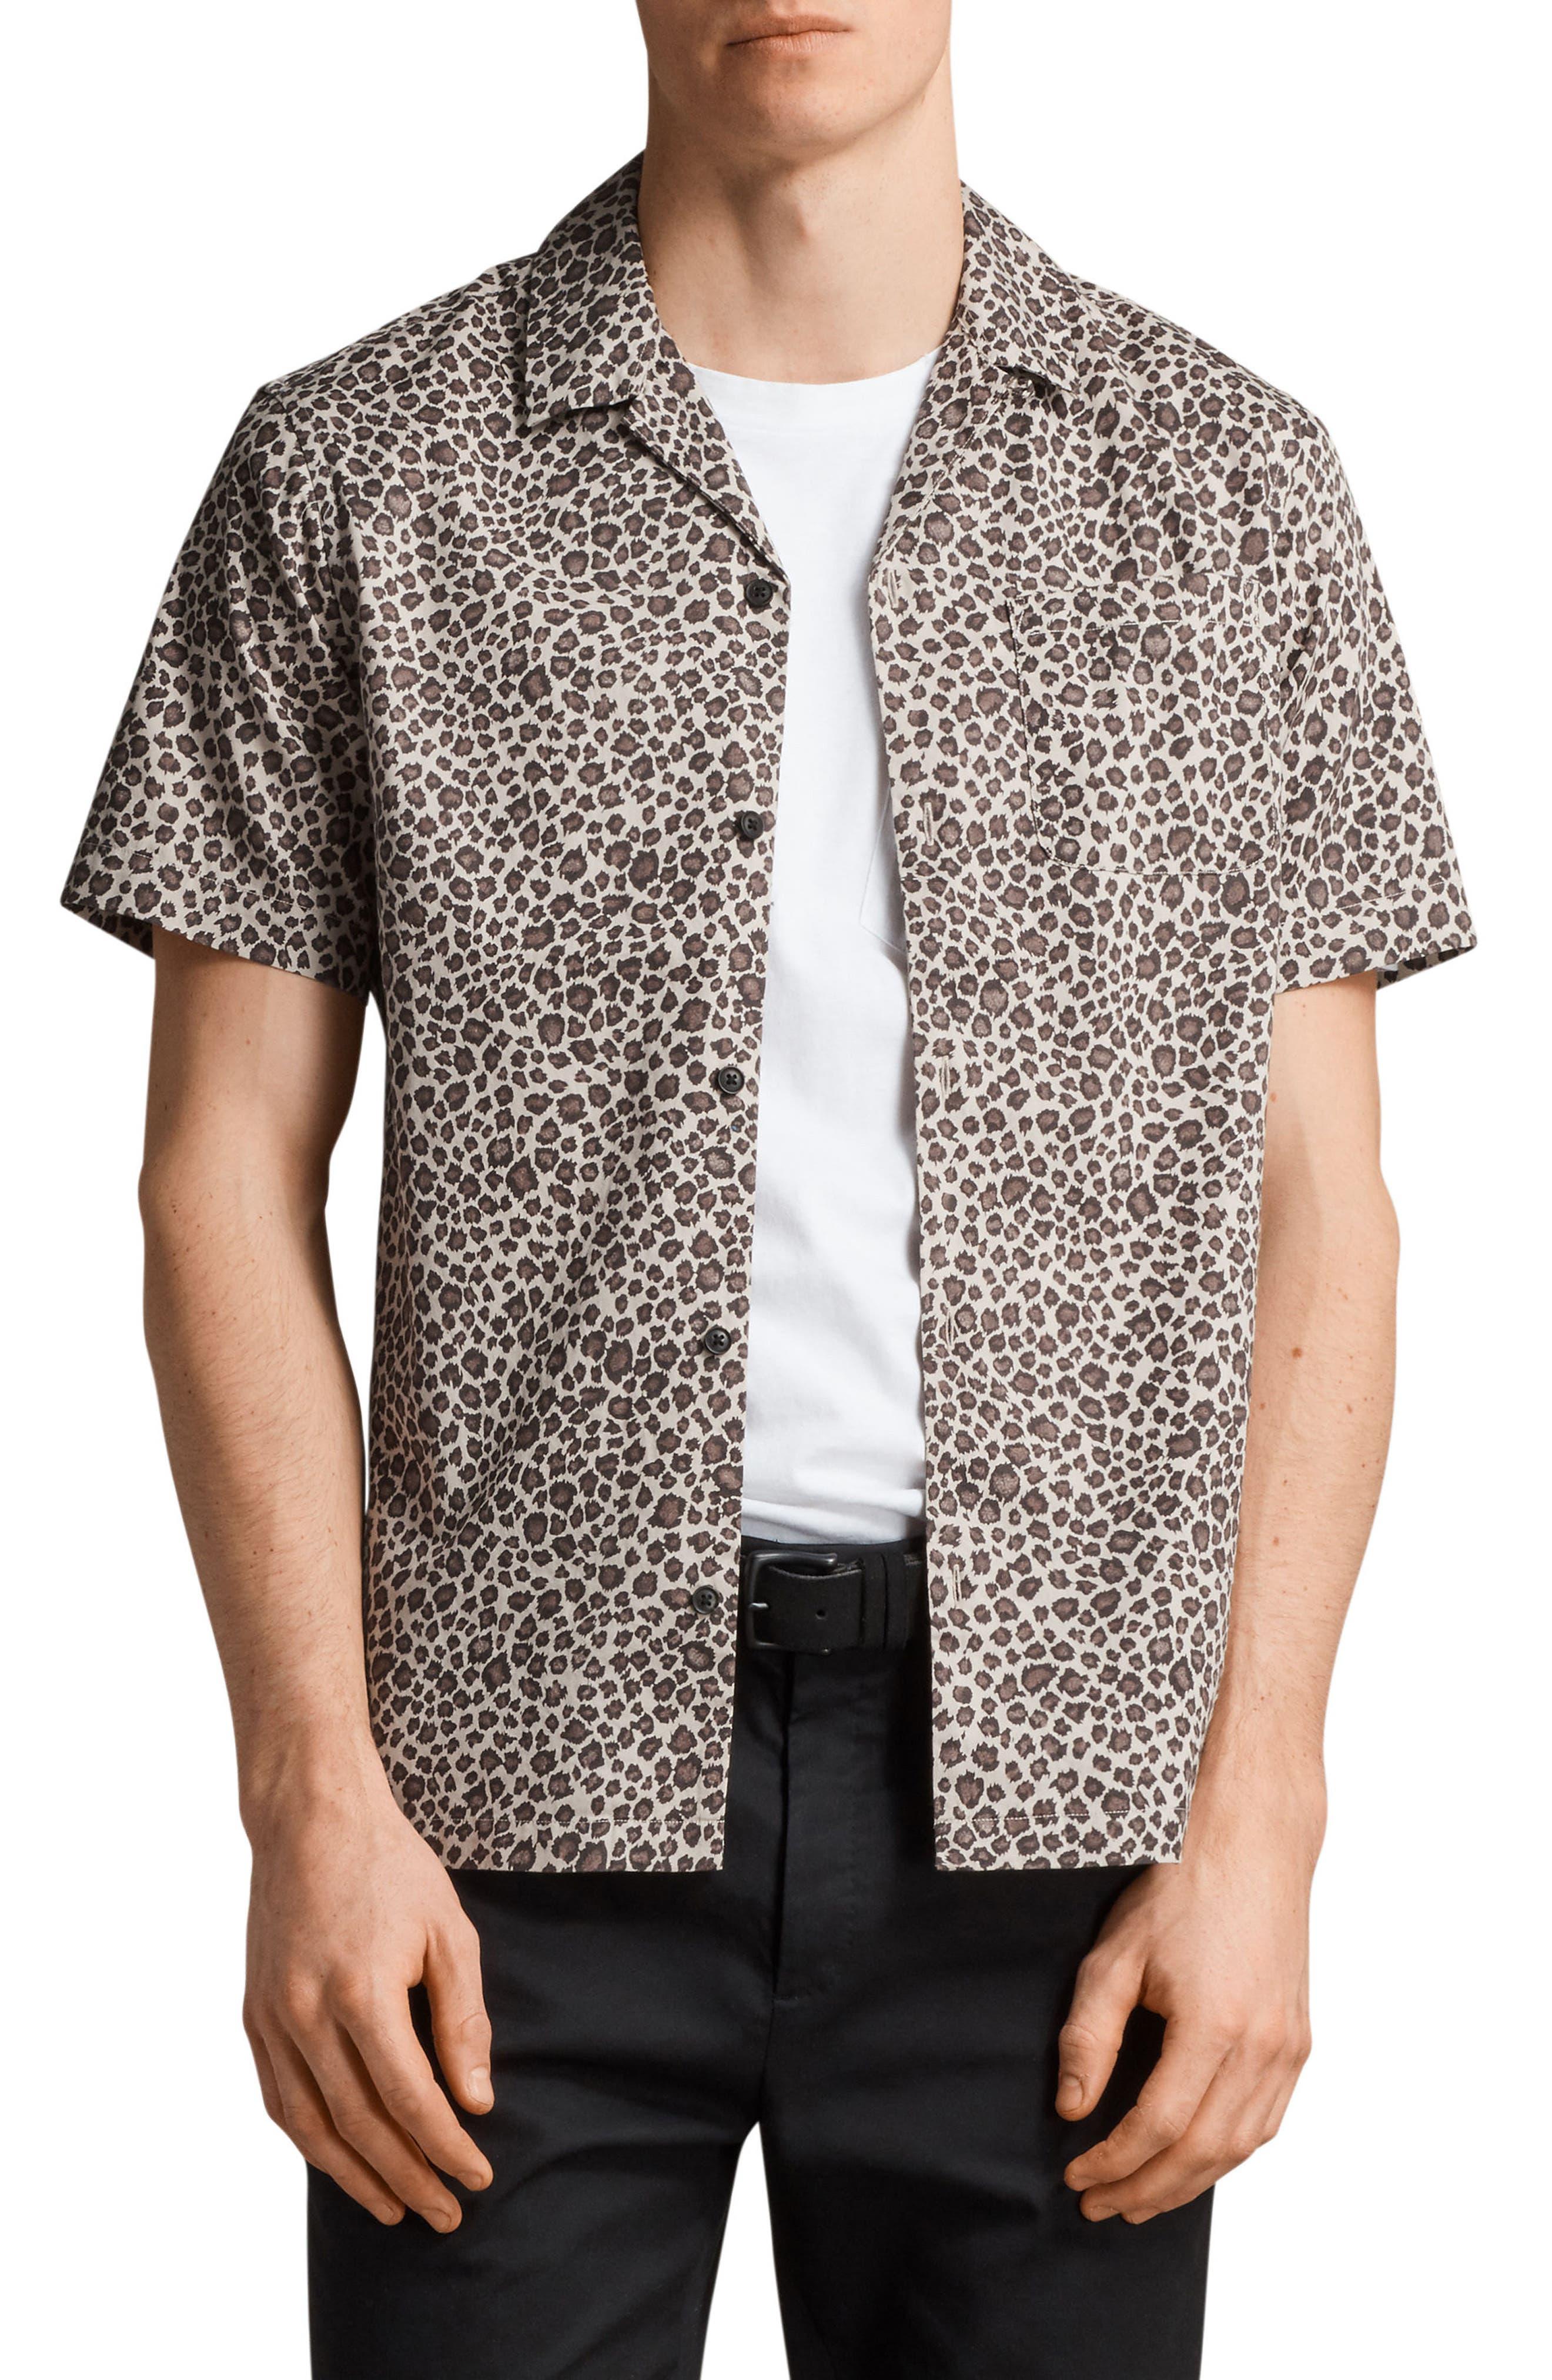 Alternate Image 1 Selected - ALLSAINTS Apex Leopard Print Short Sleeve Sport Shirt